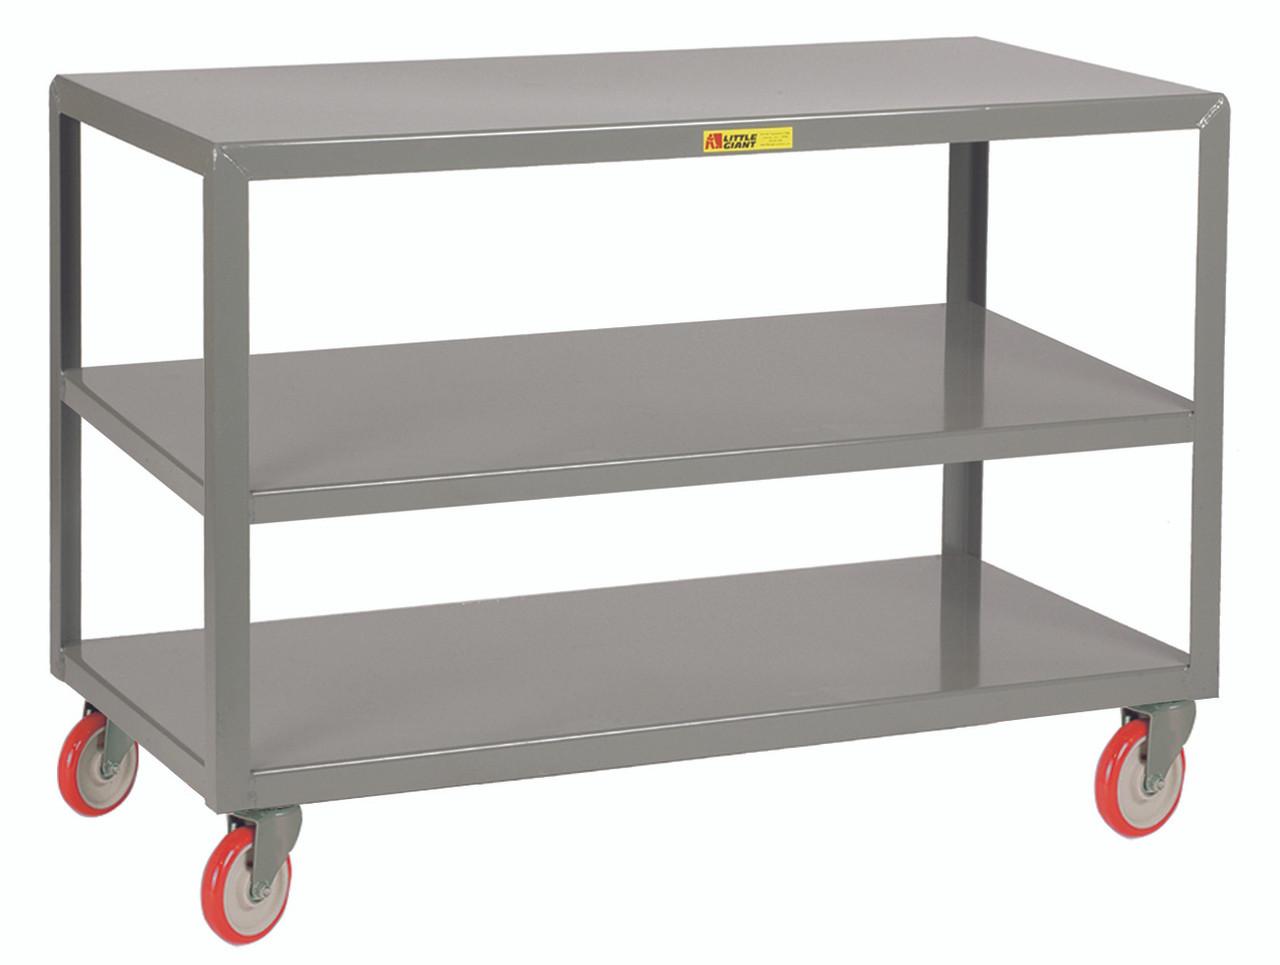 Little Giant Mobile Table - 3 Shelves, 24x36, 1200 lb Capacity